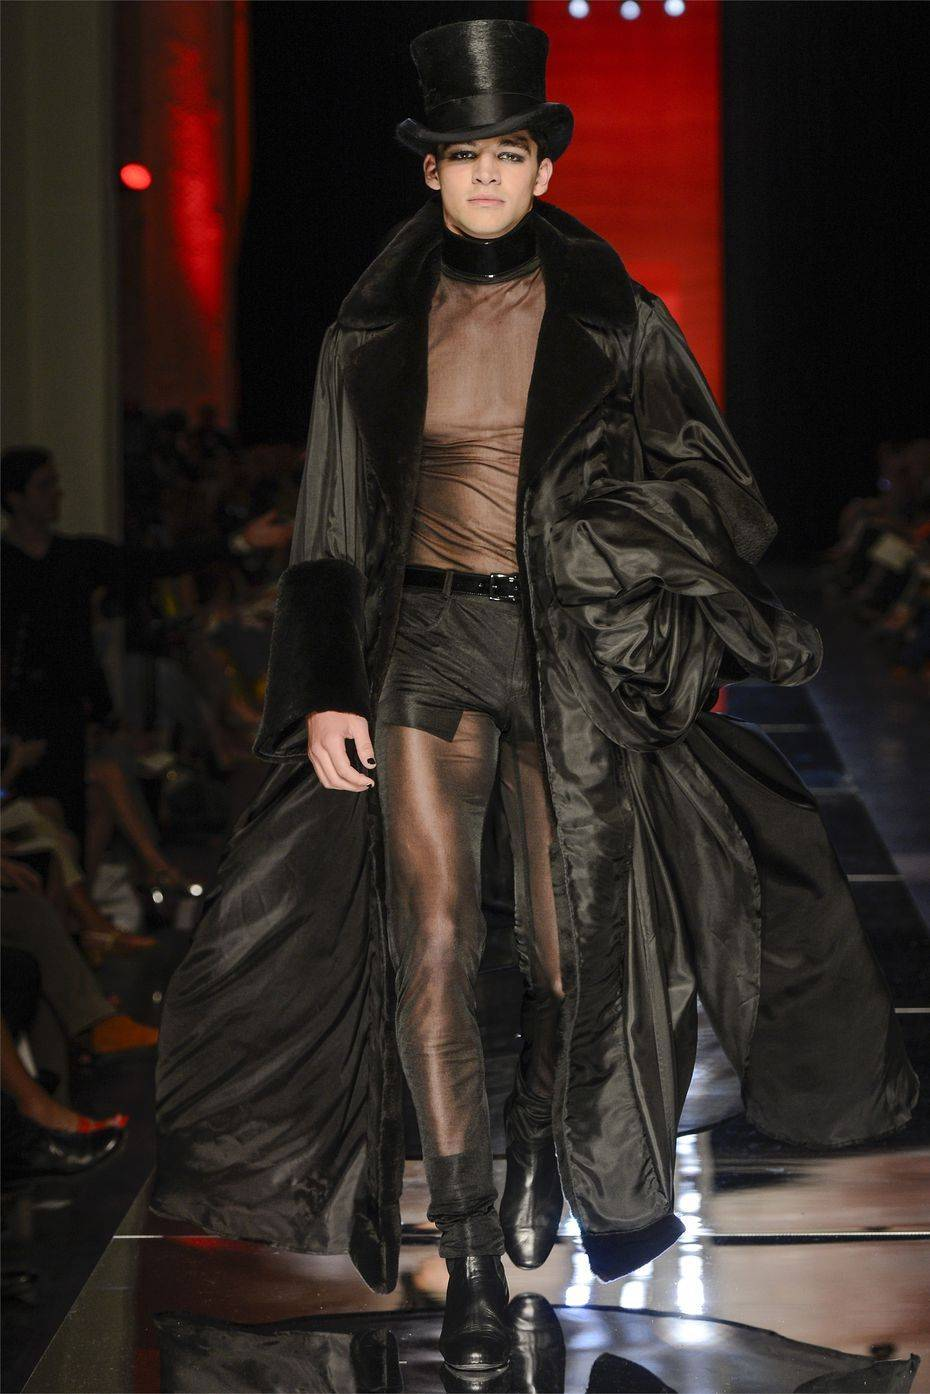 Jean paul gaultier men 39 s haute couture fall winter 2012 for Haute couture male